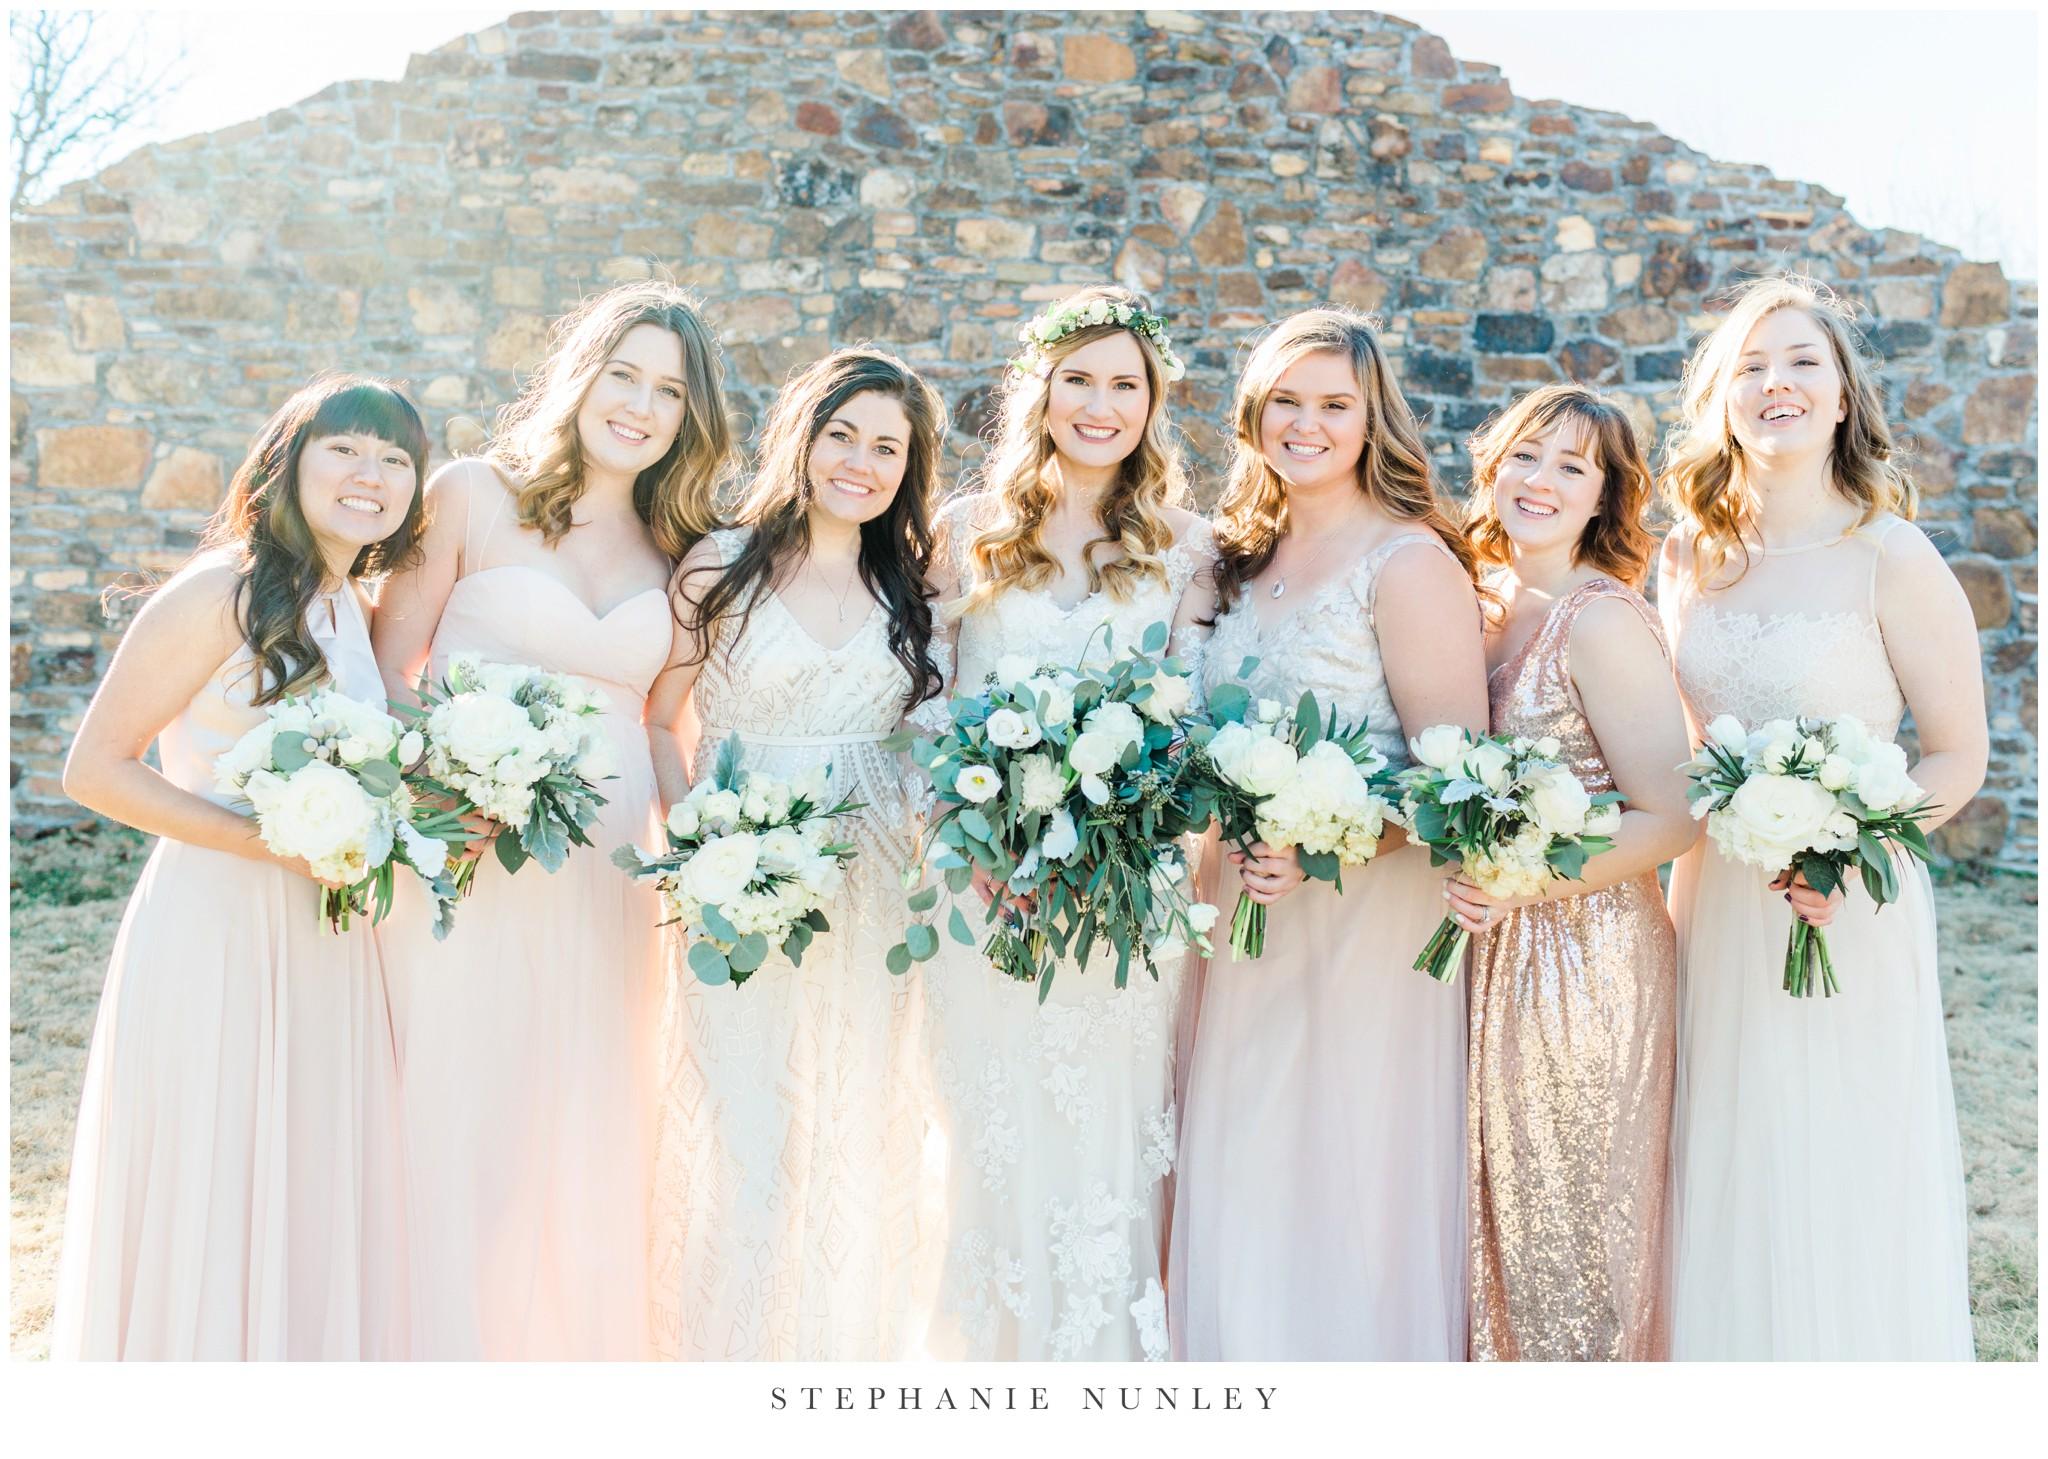 sassafrass-springs-vineyard-film-wedding-photos-51.jpg